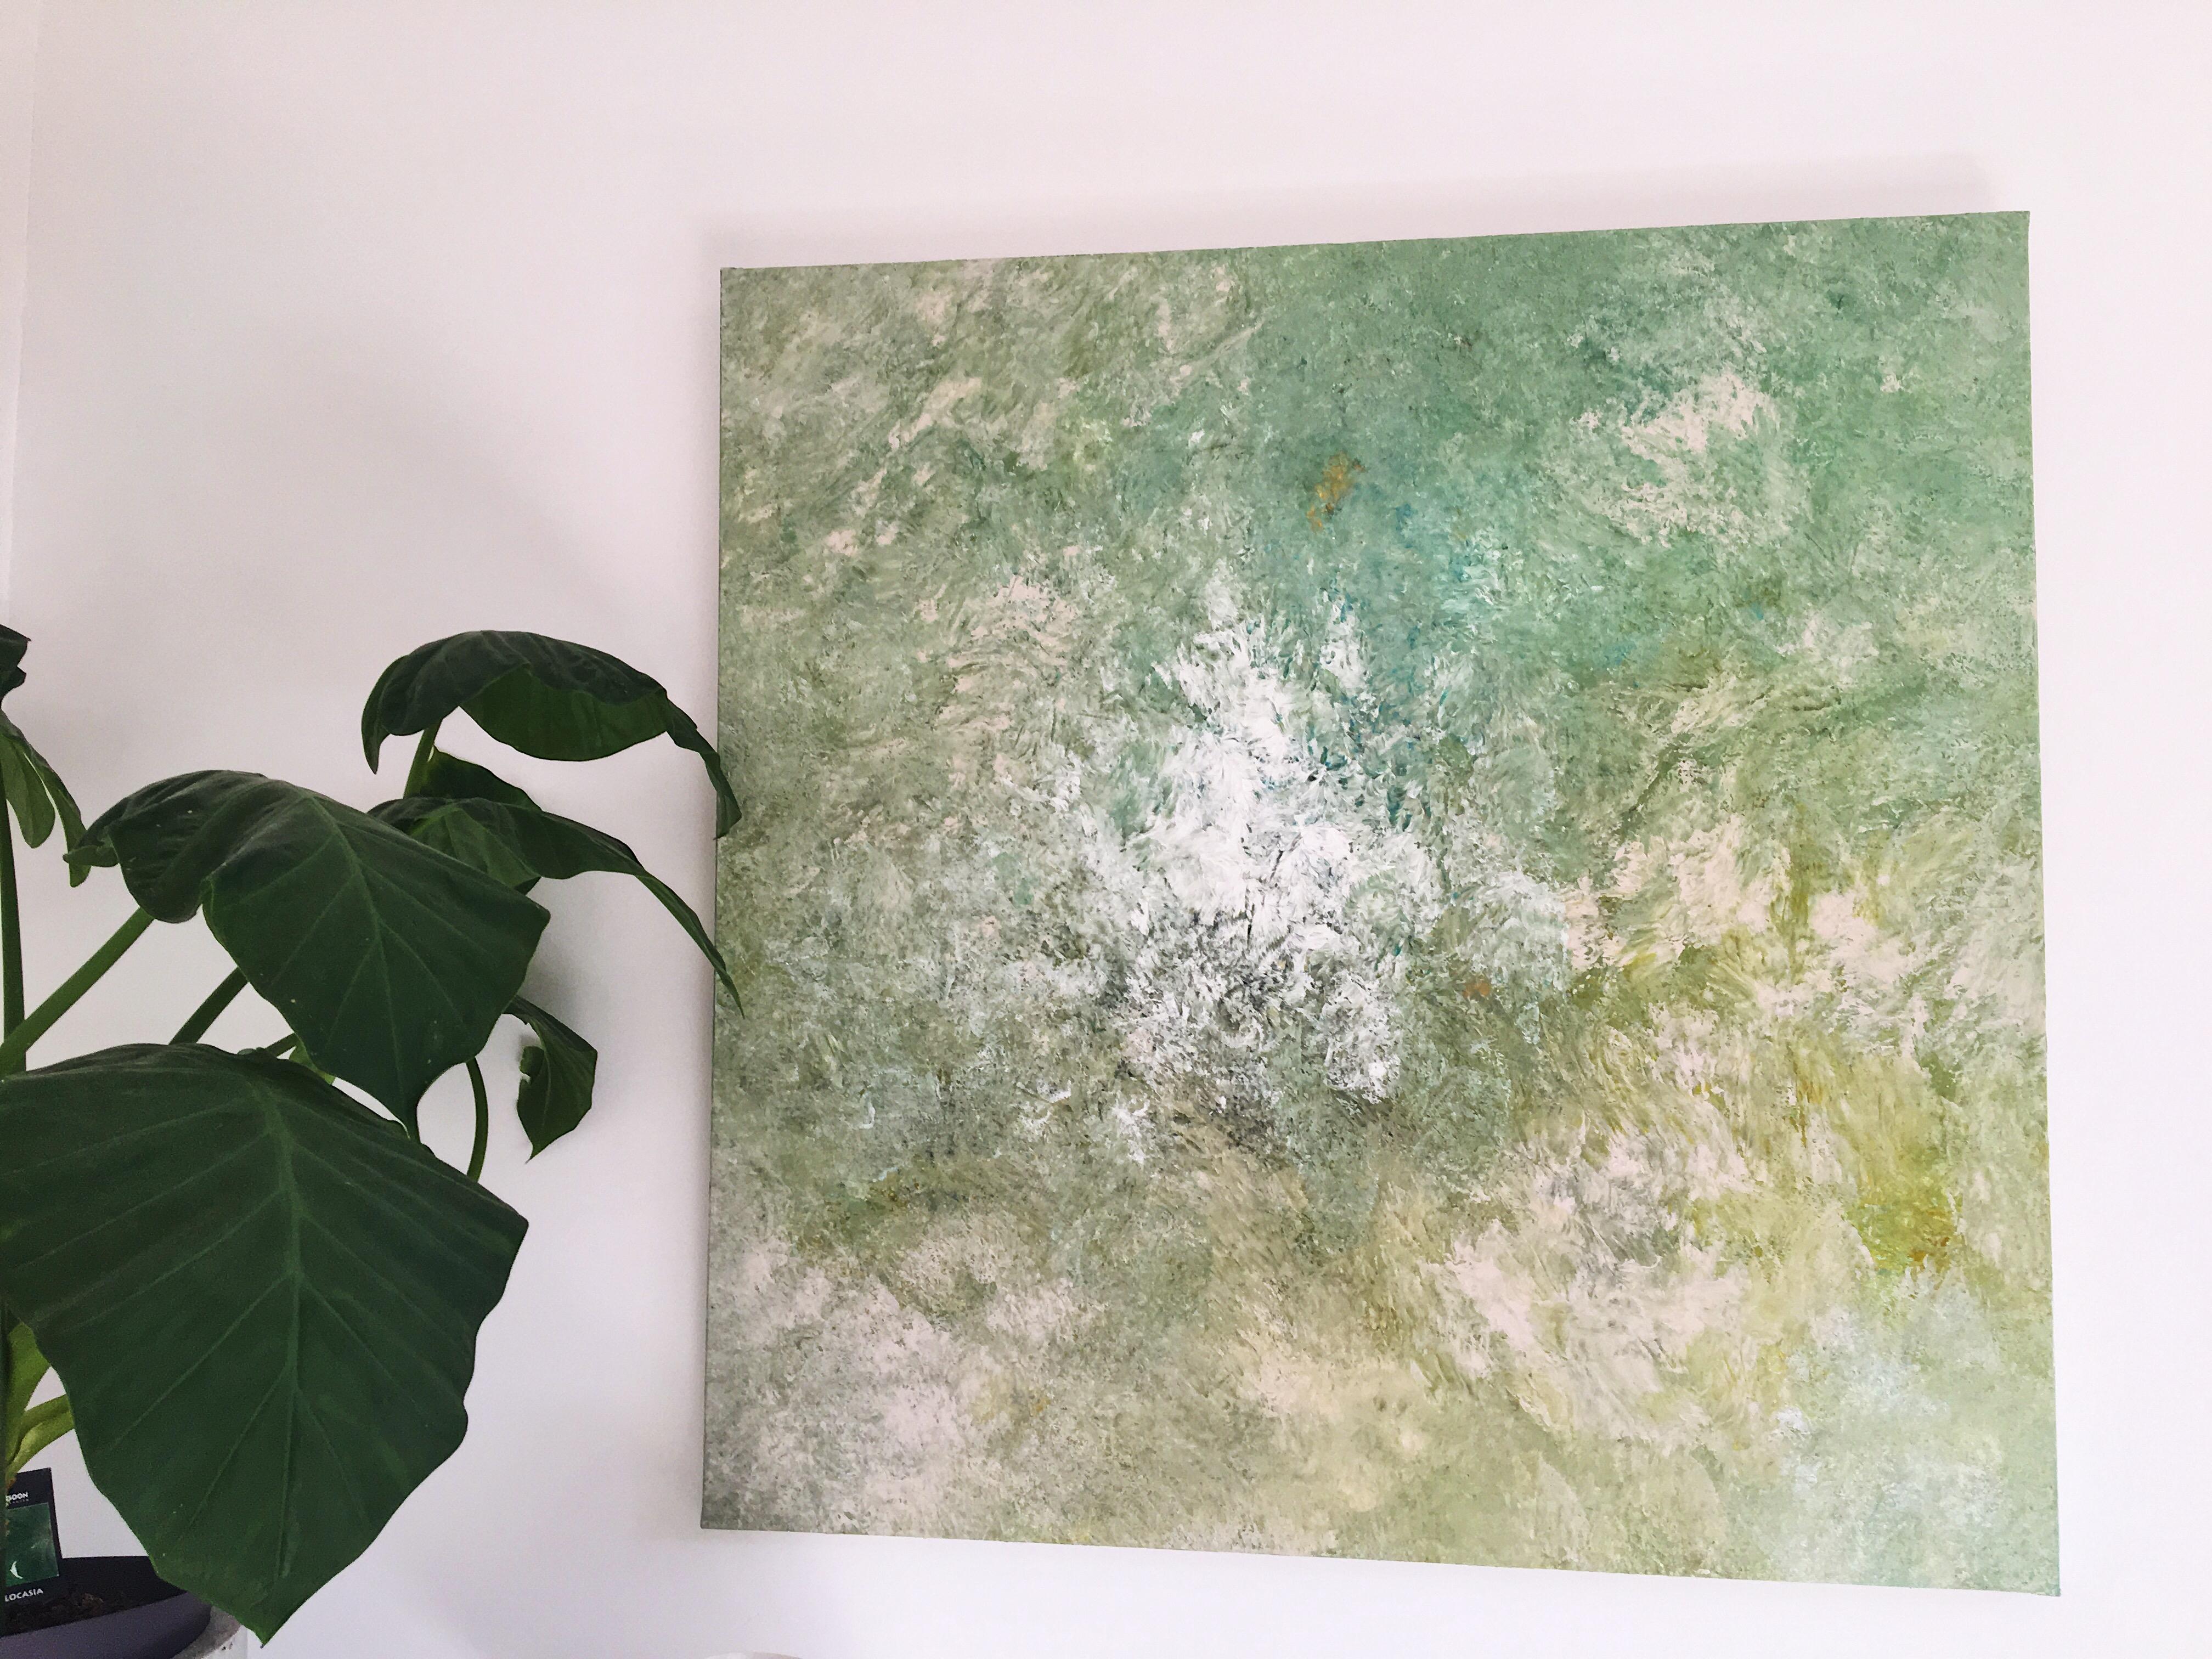 Marine Bonzom - Artiste Peintre Biarritz - Home - Jade - Constantine